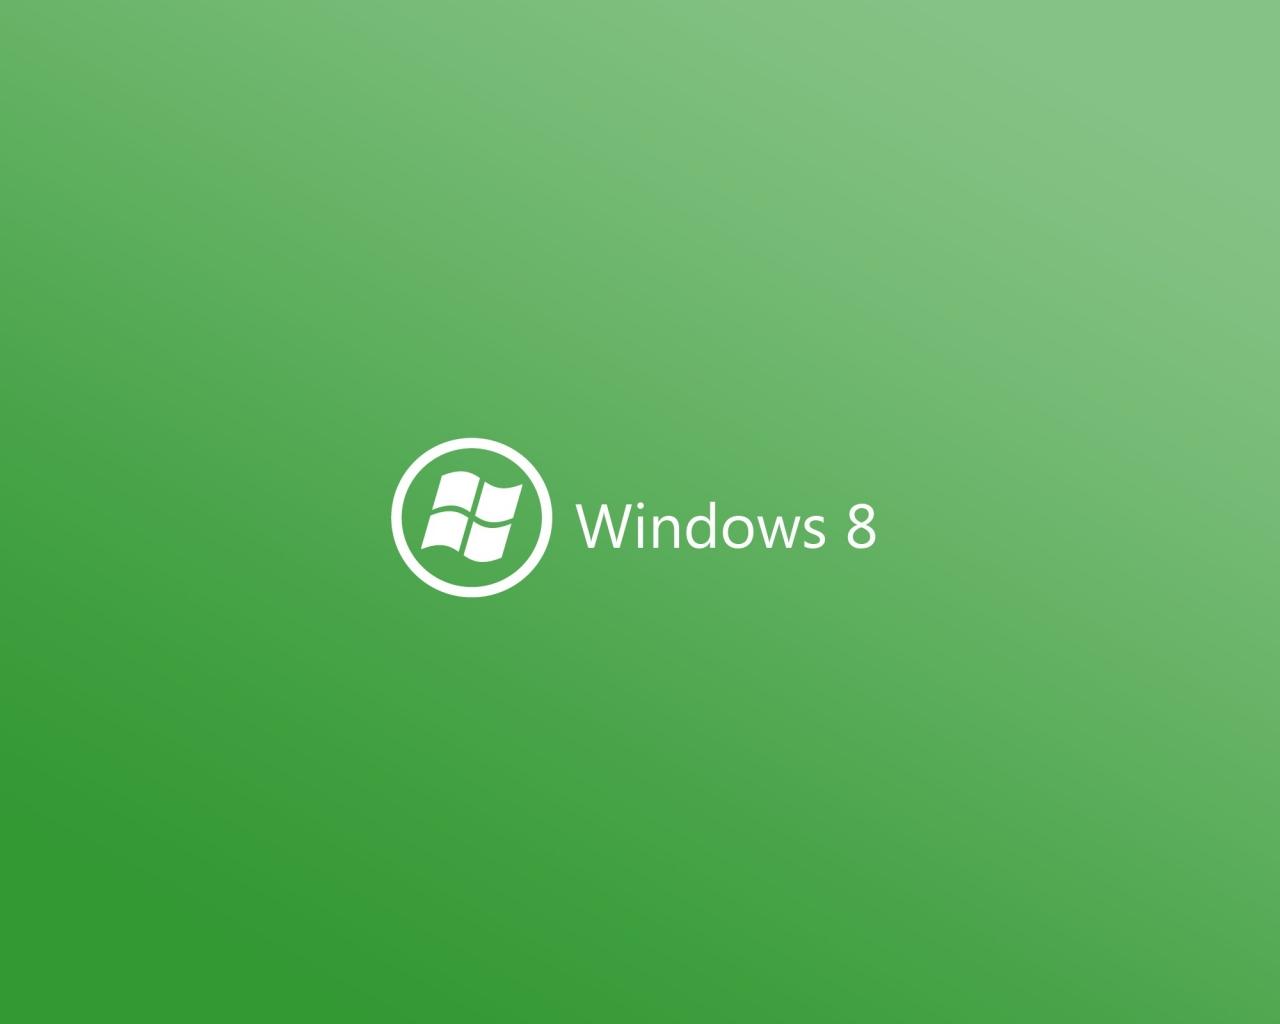 Windows 8 verde - 1280x1024